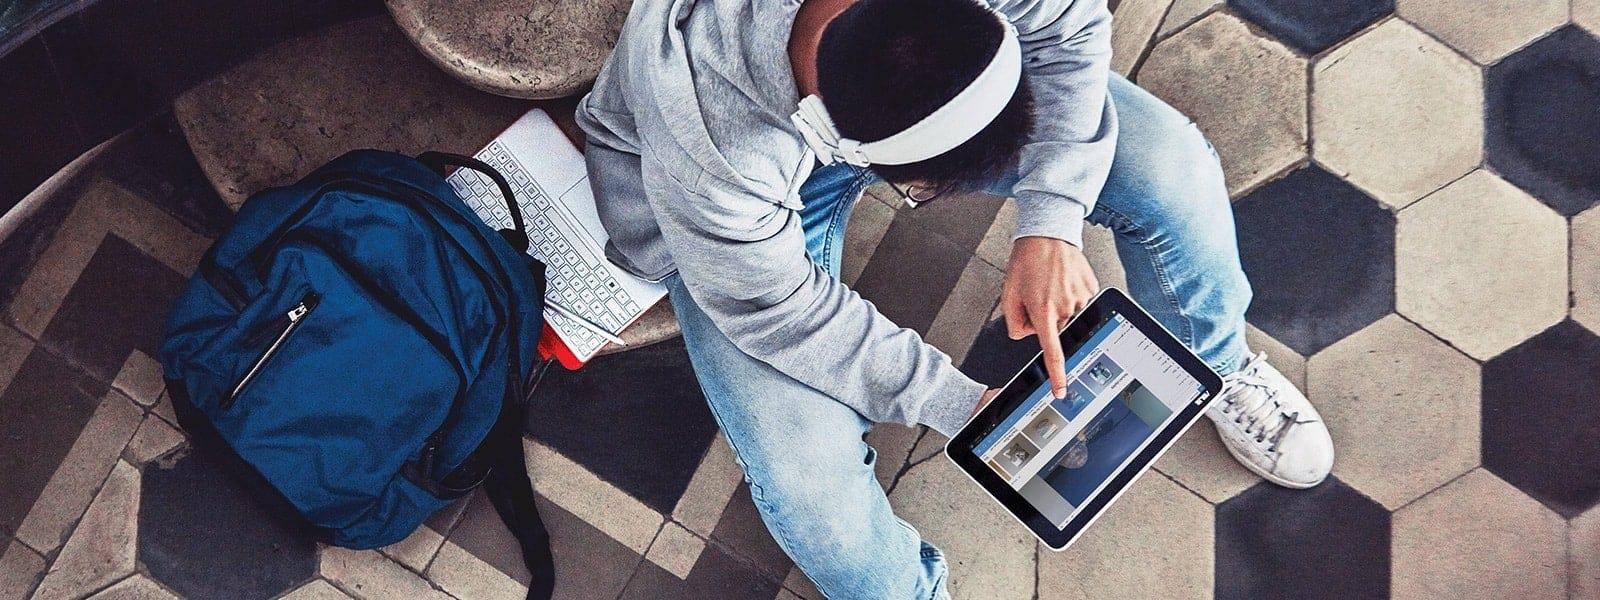 Windows 10 디바이스를 보고 있는 학생